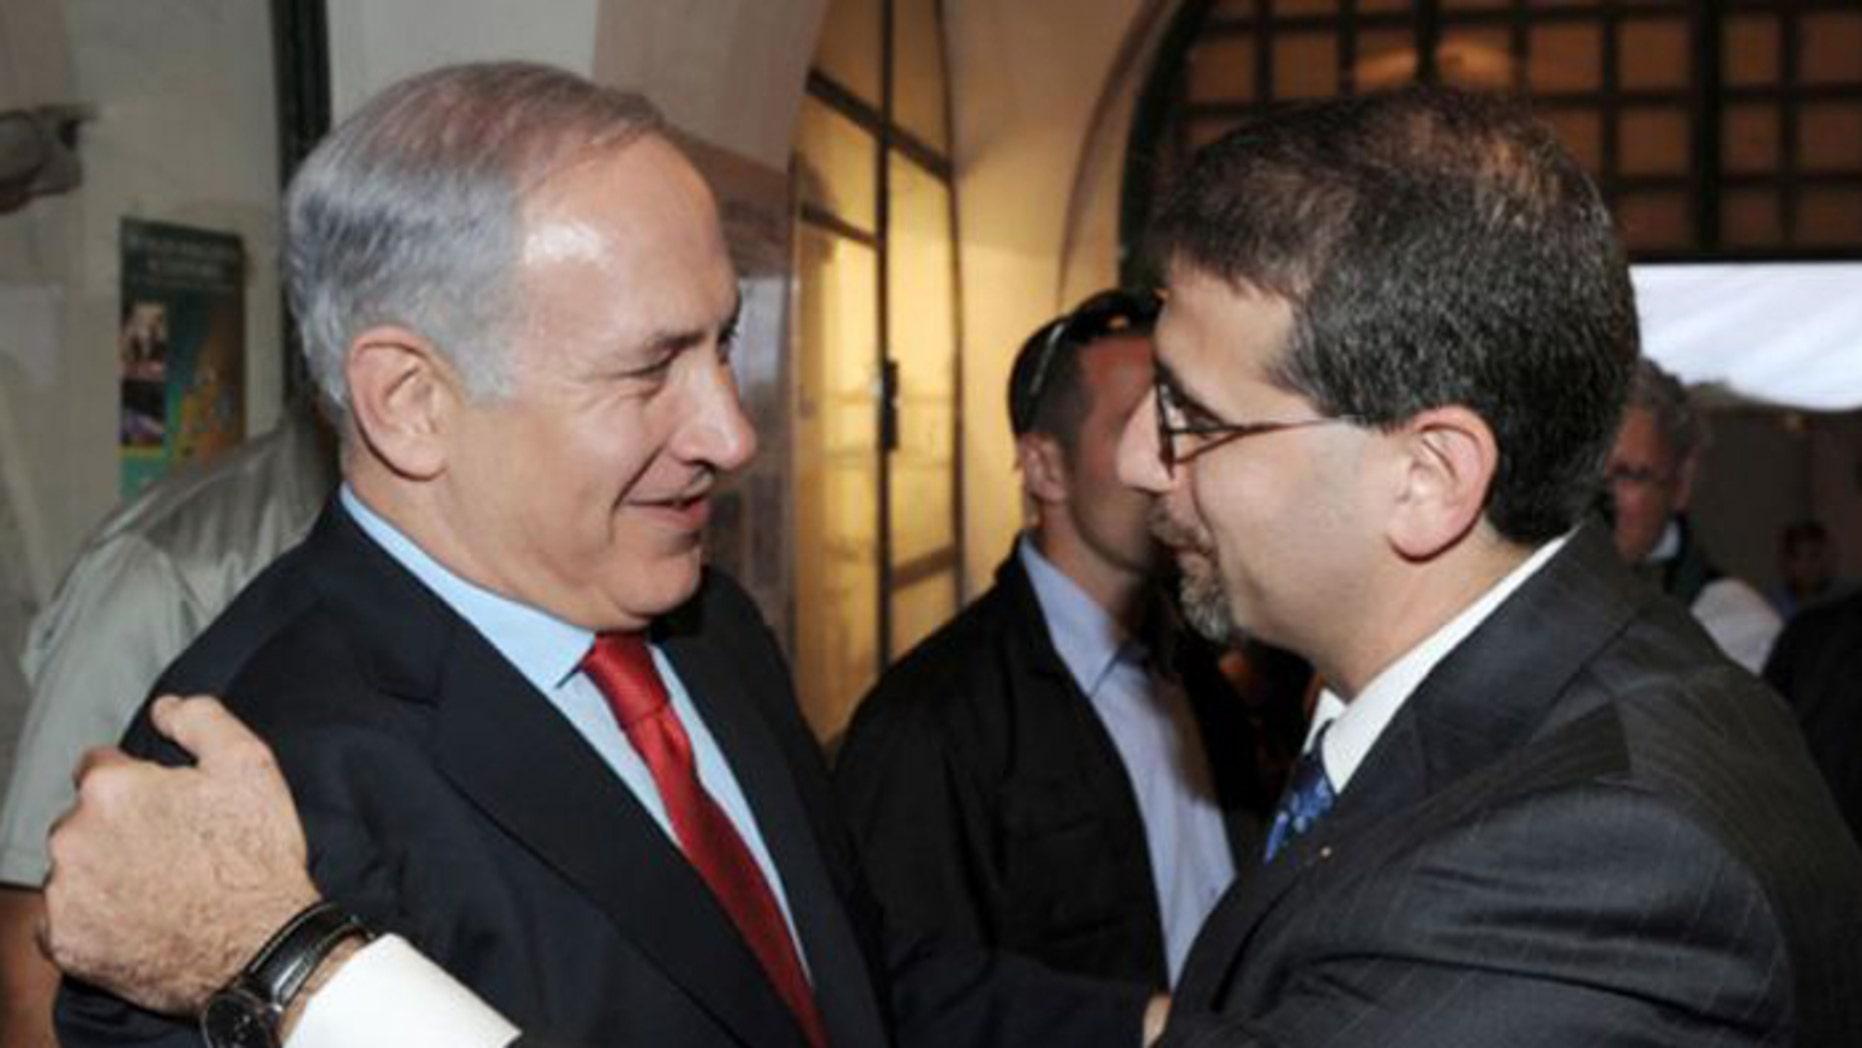 U.S. Ambassador to Israel Daniel Shapiro, (r.), is offering assurances to Israelis that America has her back. (Reuters)